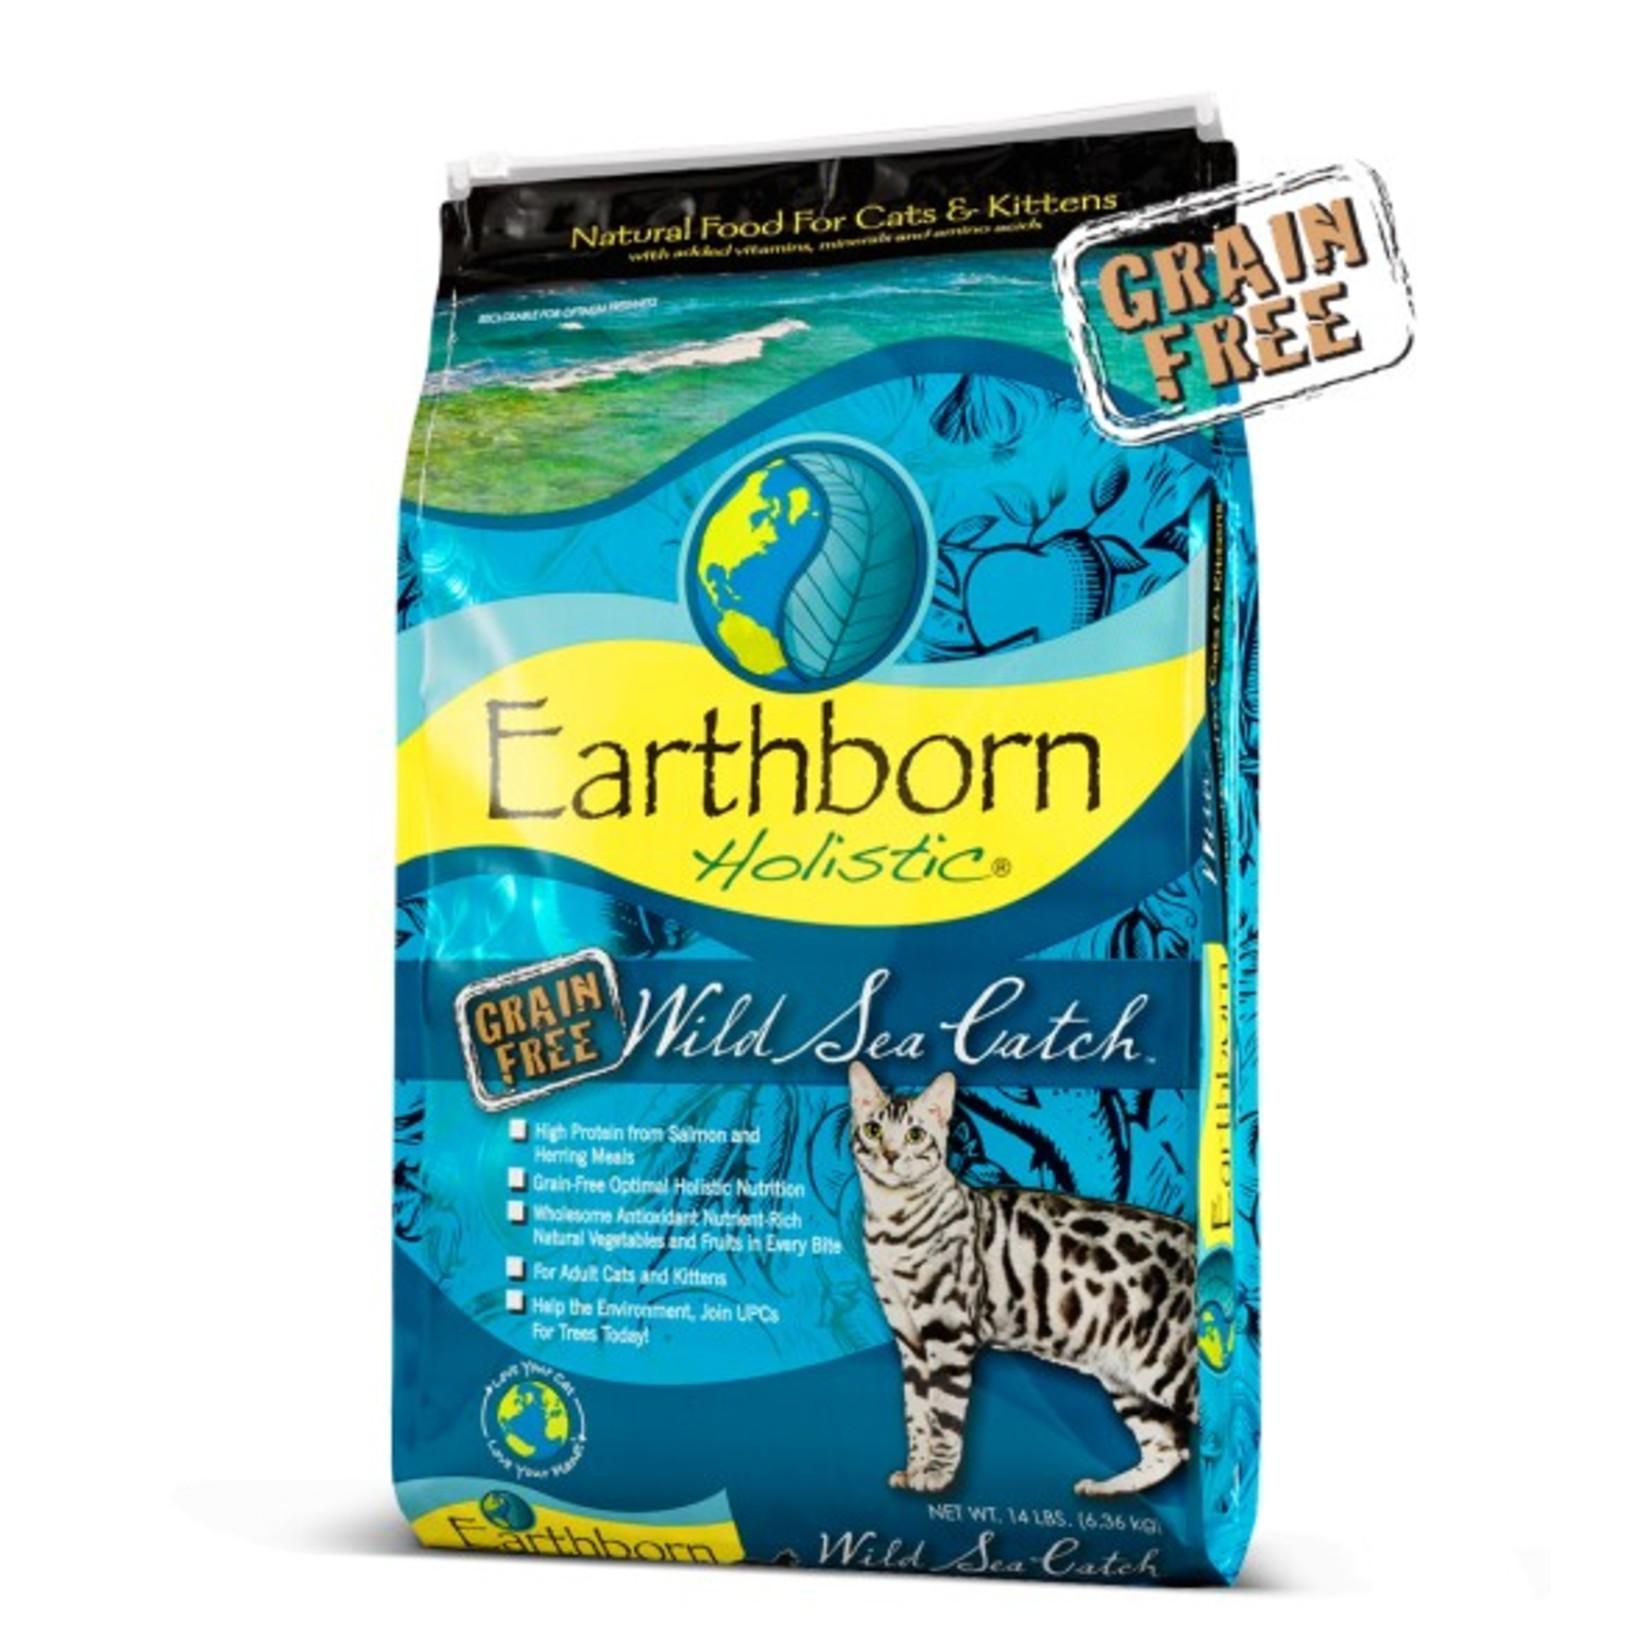 Earthborn Earthborn Wild Sea Catch Cat Food